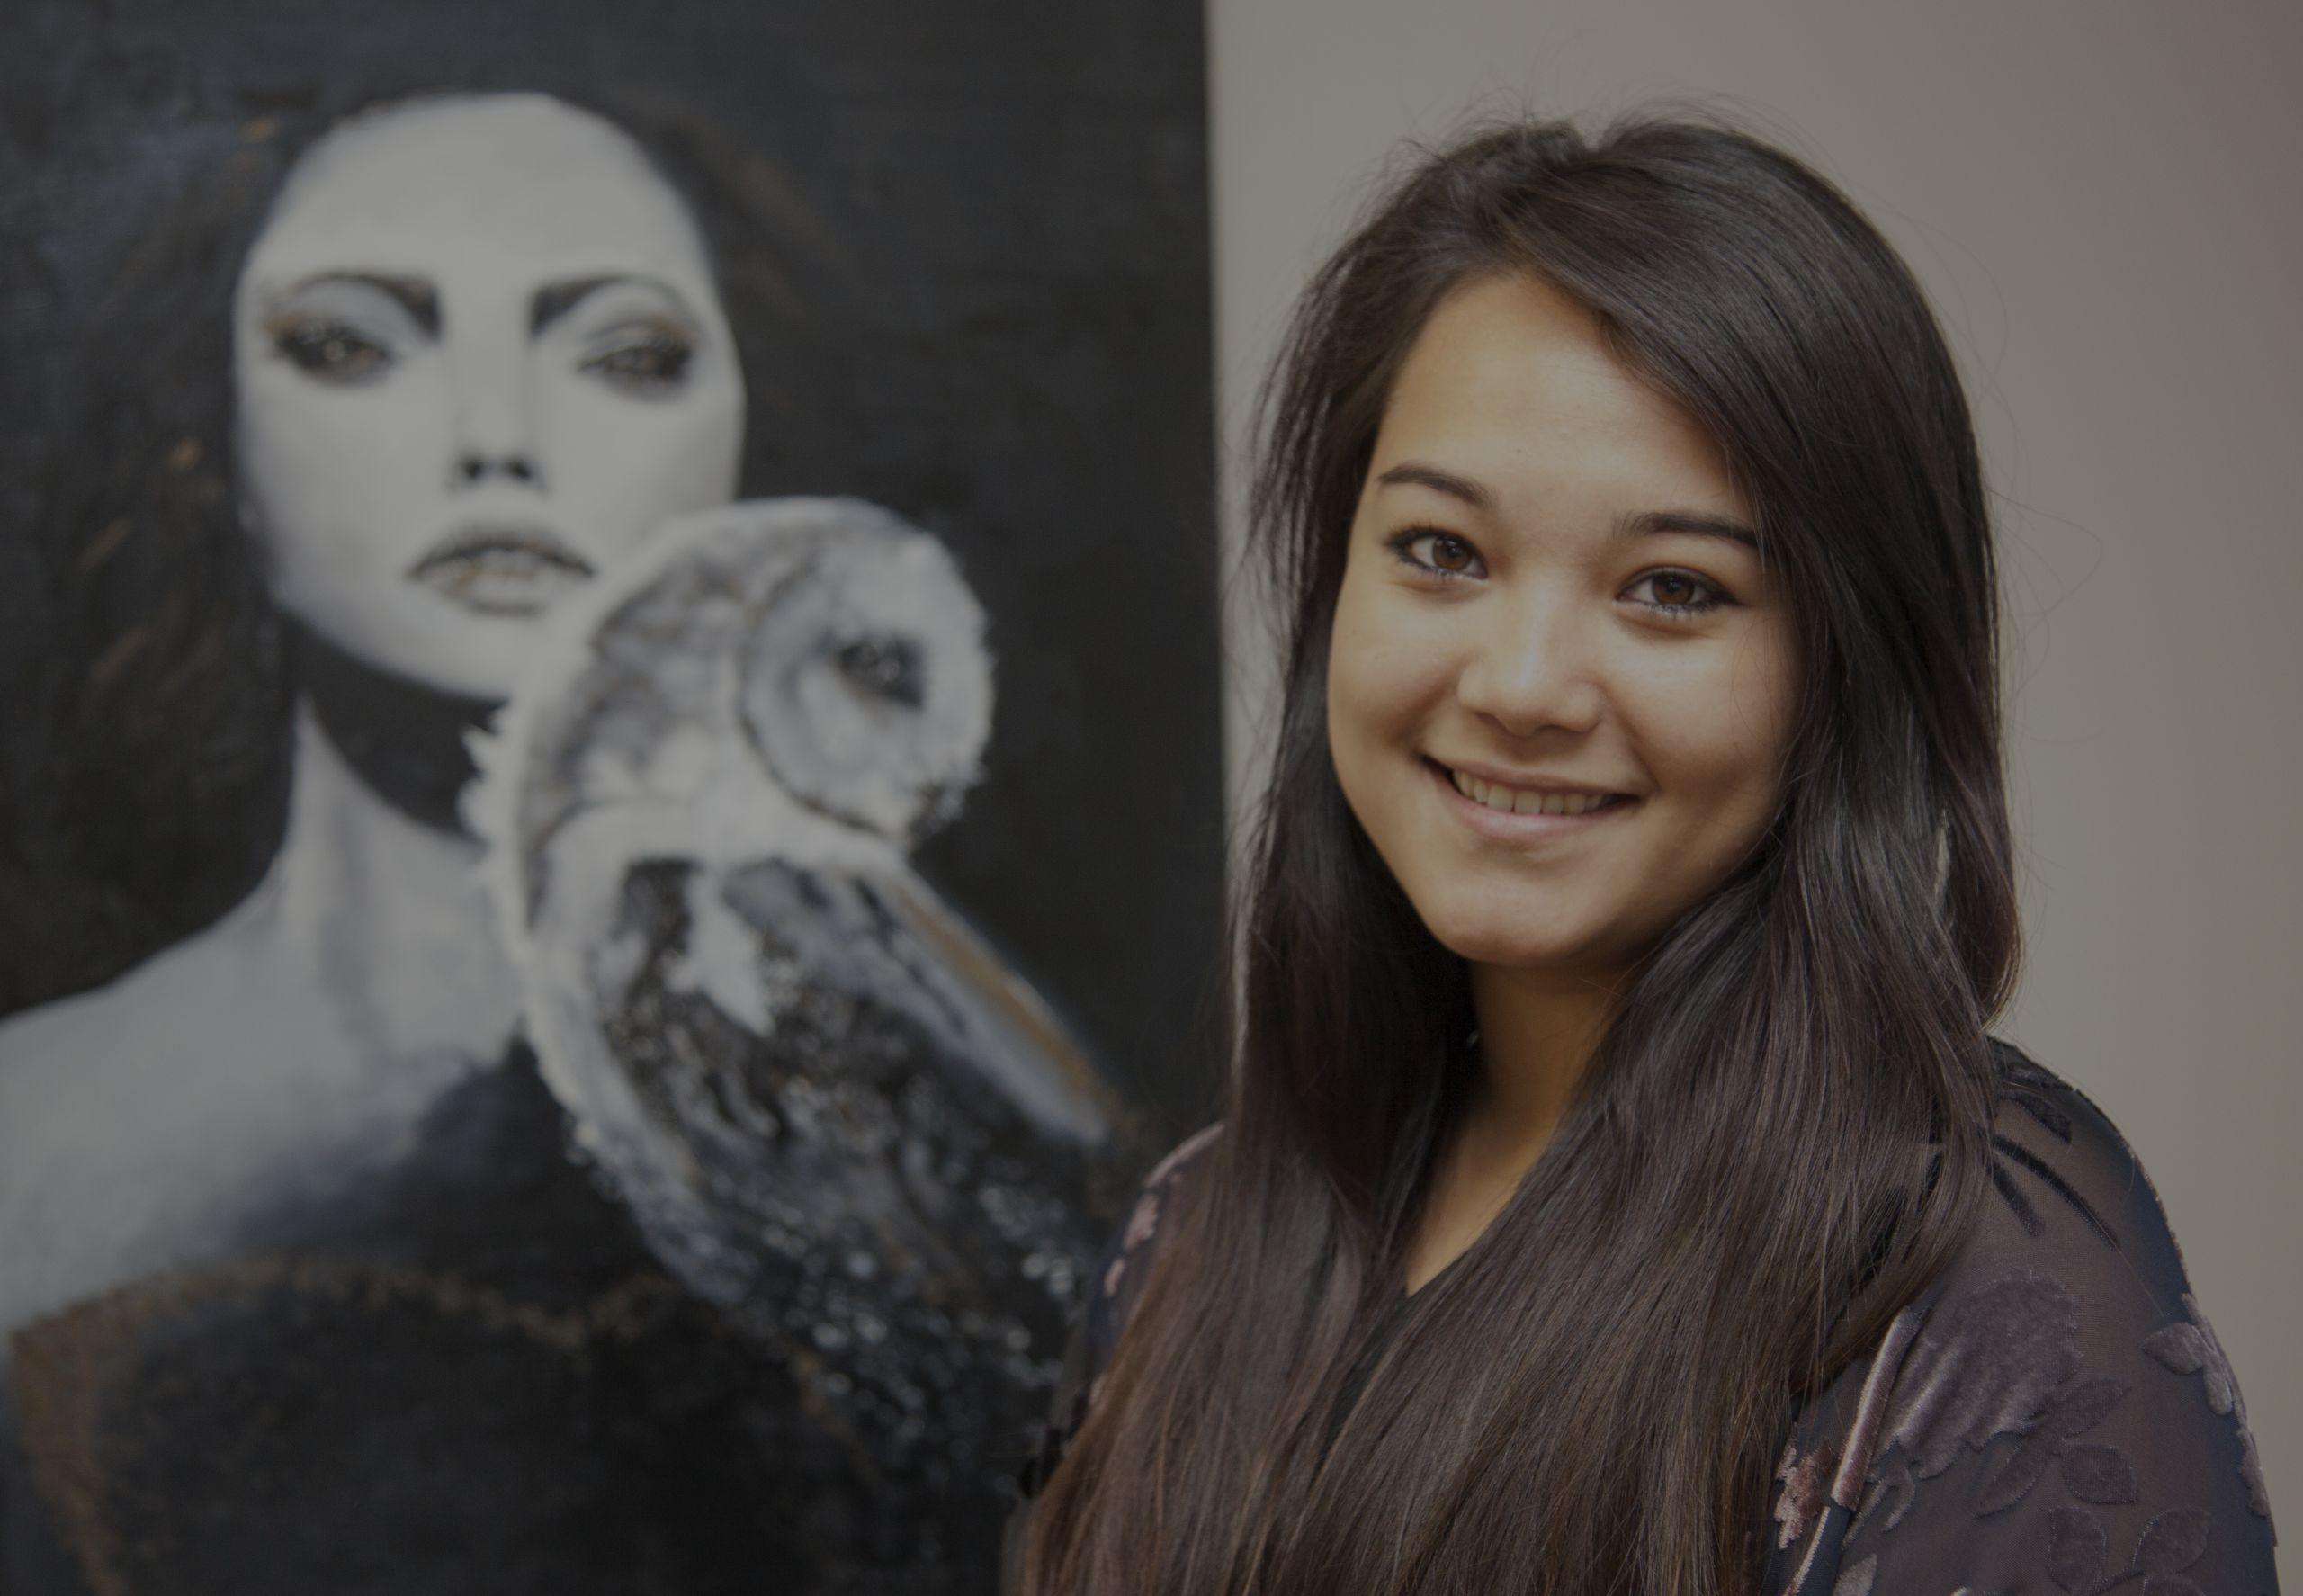 Ashley Bayne Student, Local Charlotte Artist